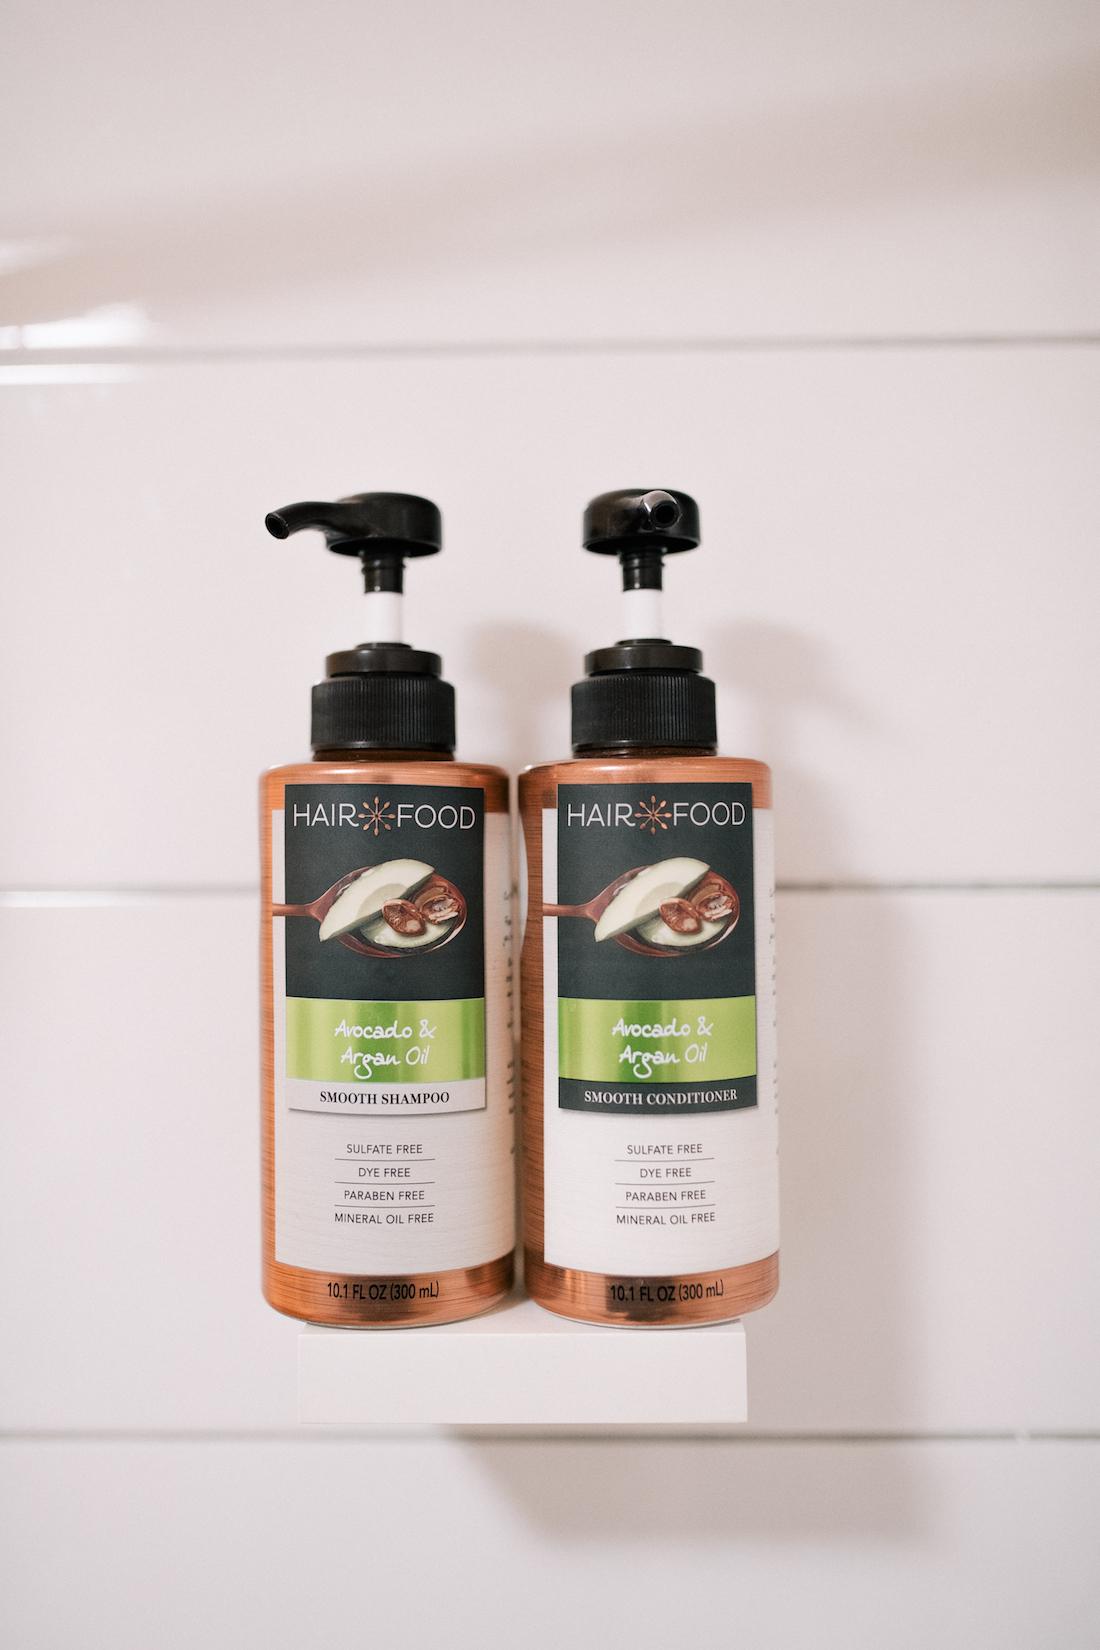 Hair Food - Avocado & Argan Oil Smooth Shampoo and Conditioner